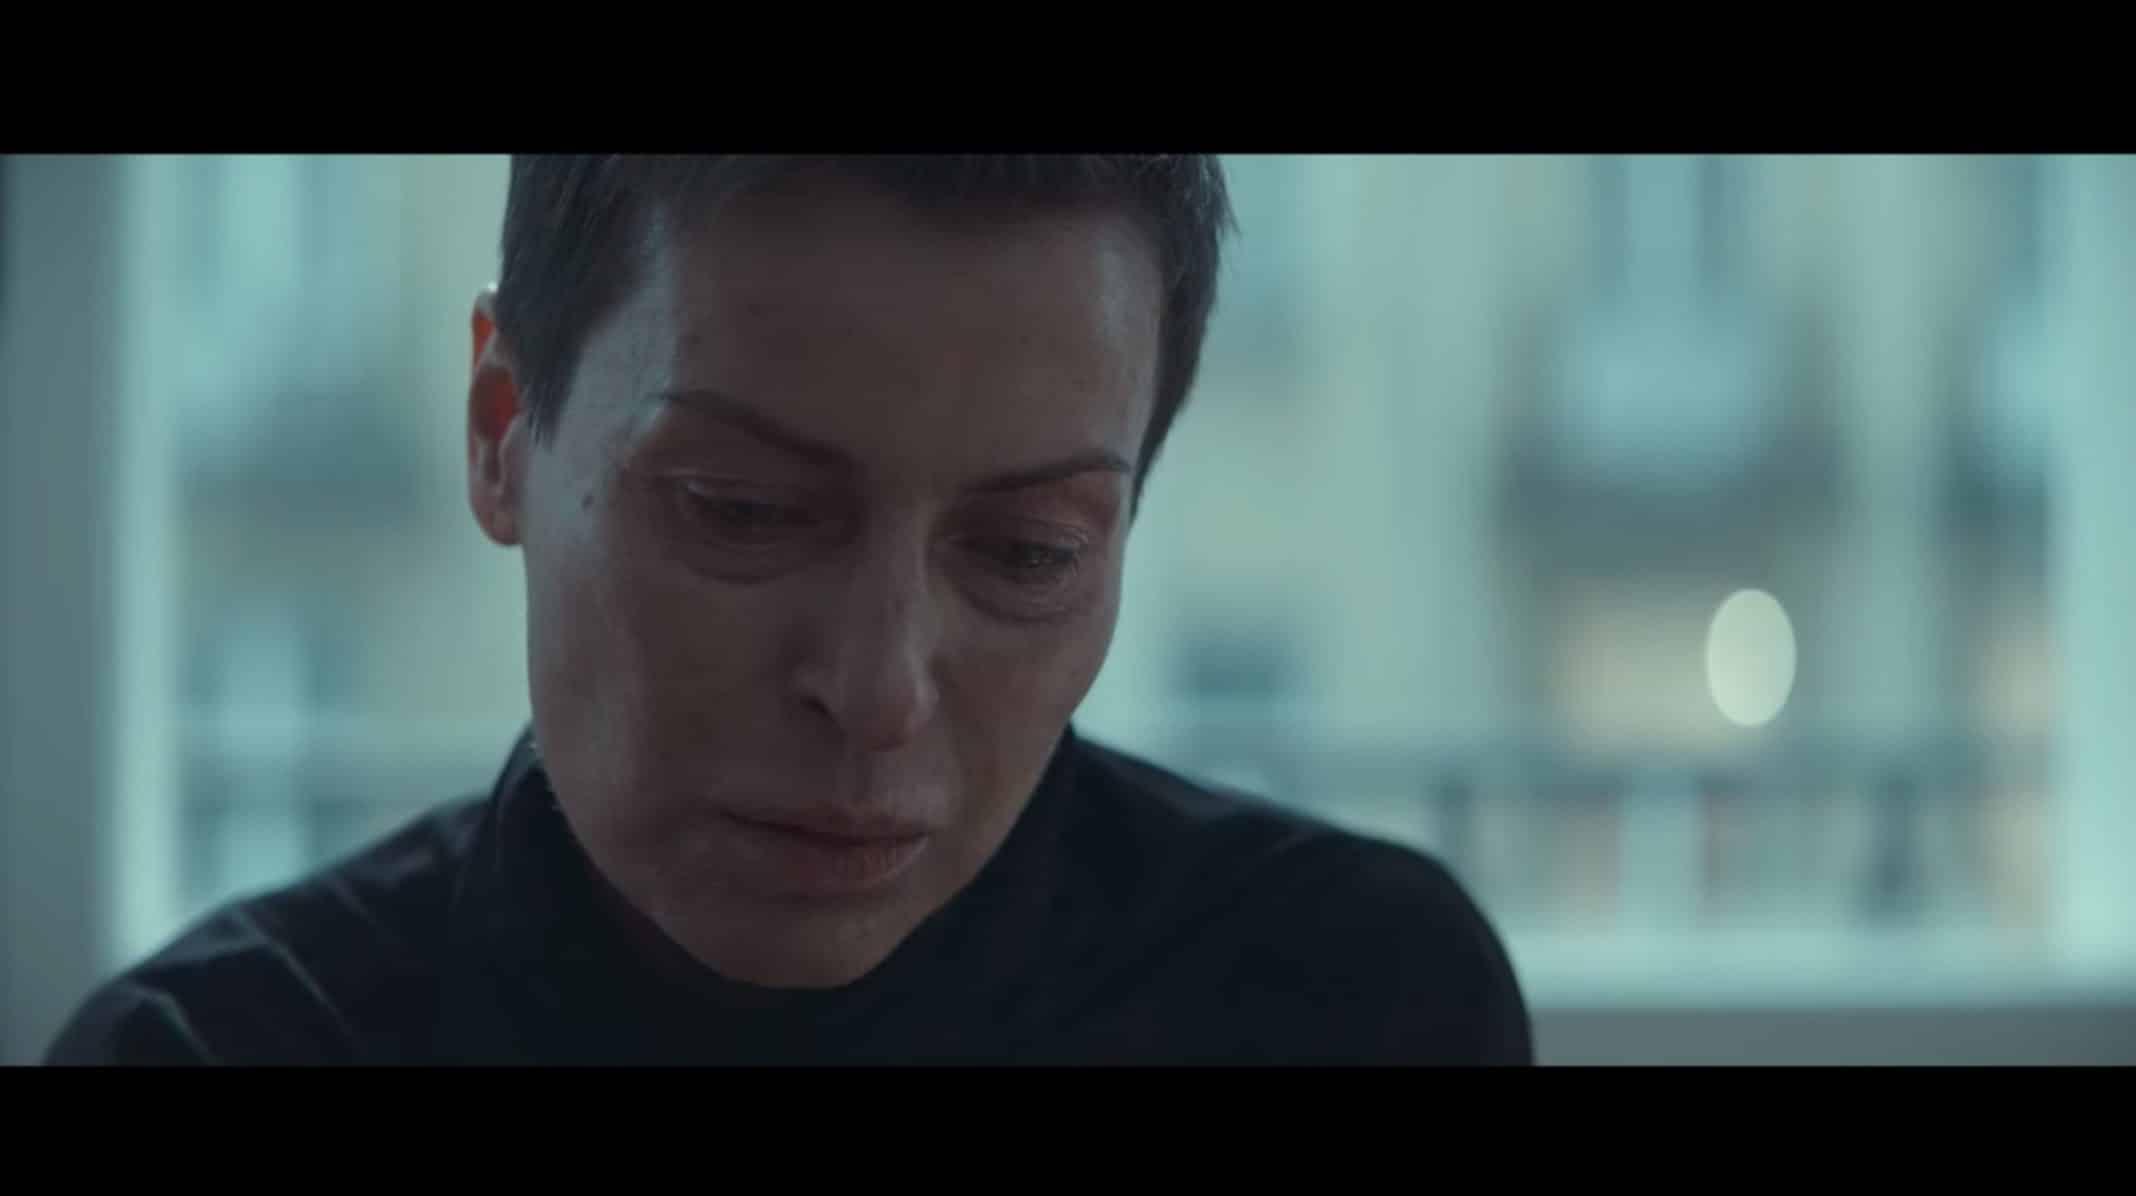 Zofia (Danuta Stenka) distraught.